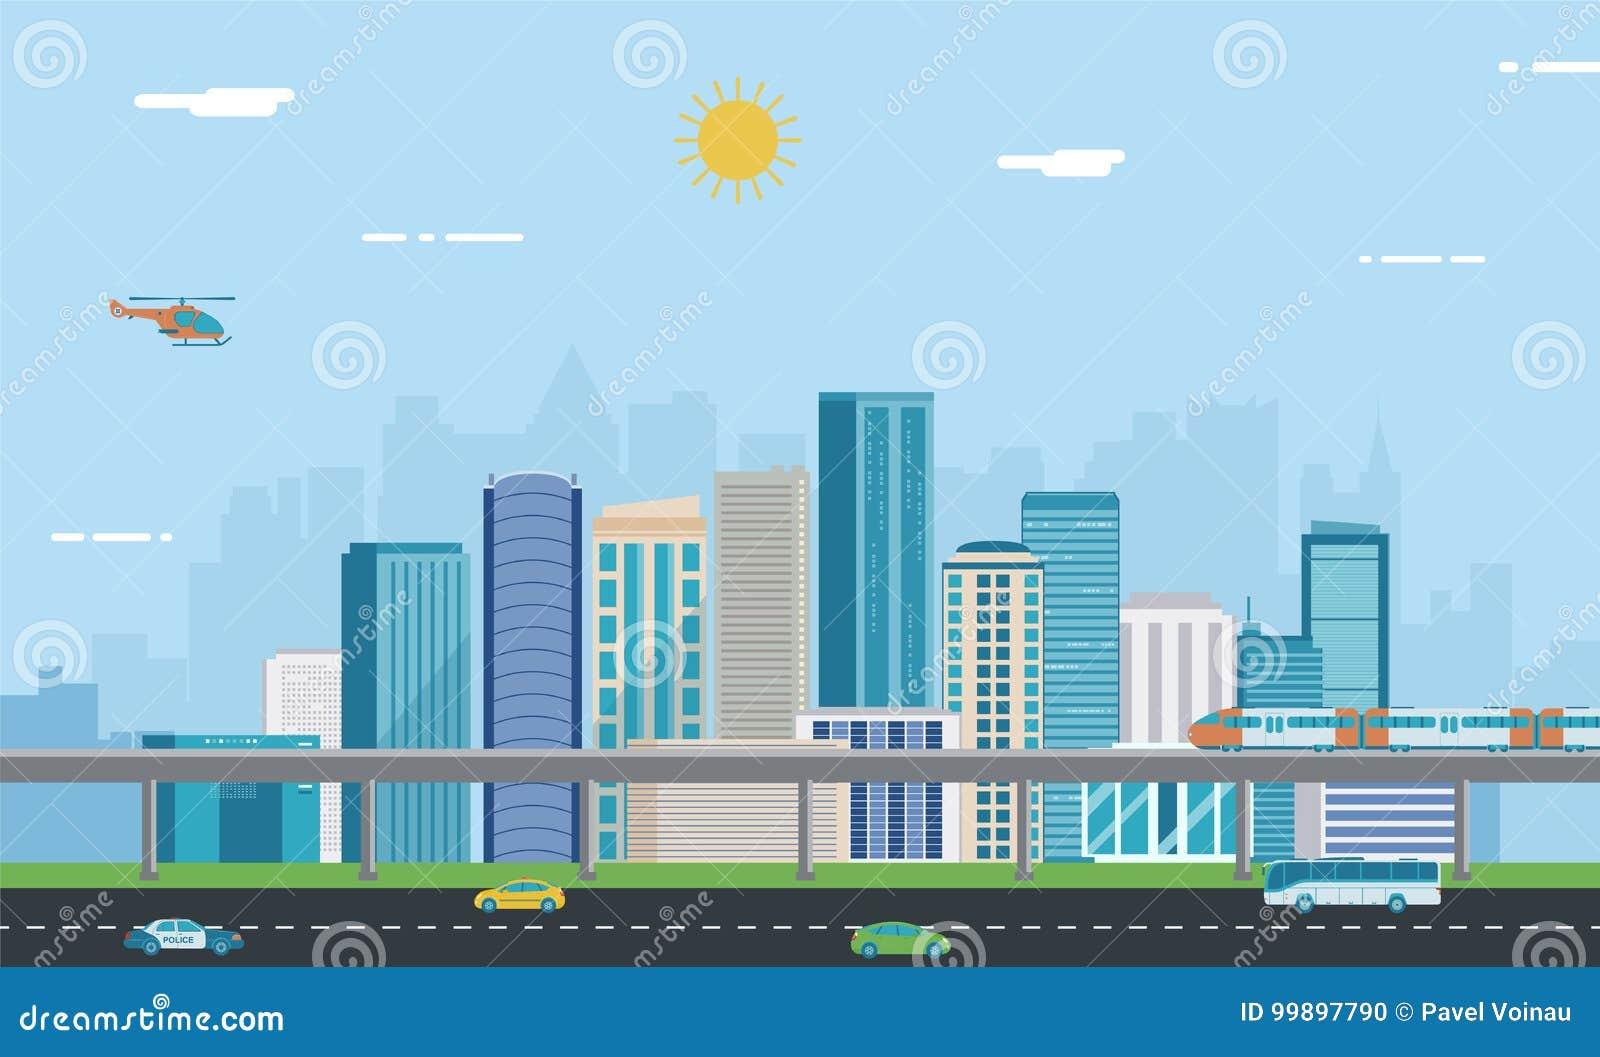 Landscape urban πόλη σύγχρονη Αρχιτεκτονική οικοδόμησης, πόλη εικονικής παράστασης πόλης διάνυσμα